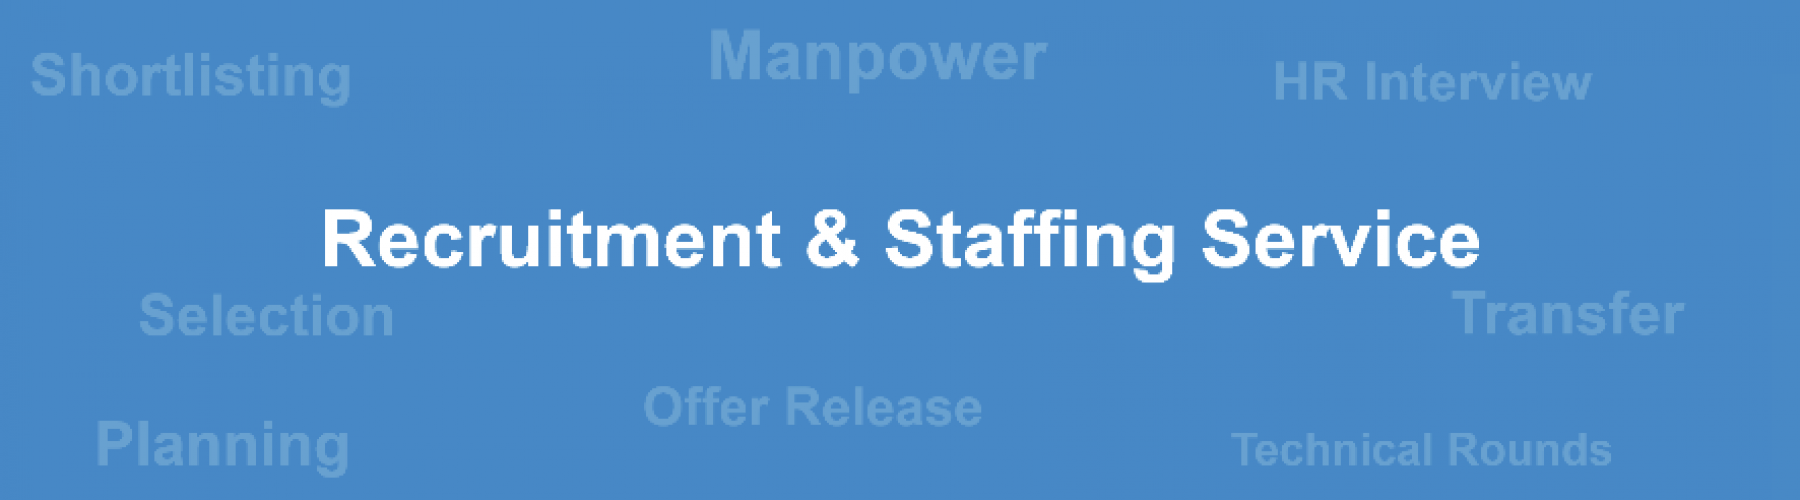 Recritment & Staffing